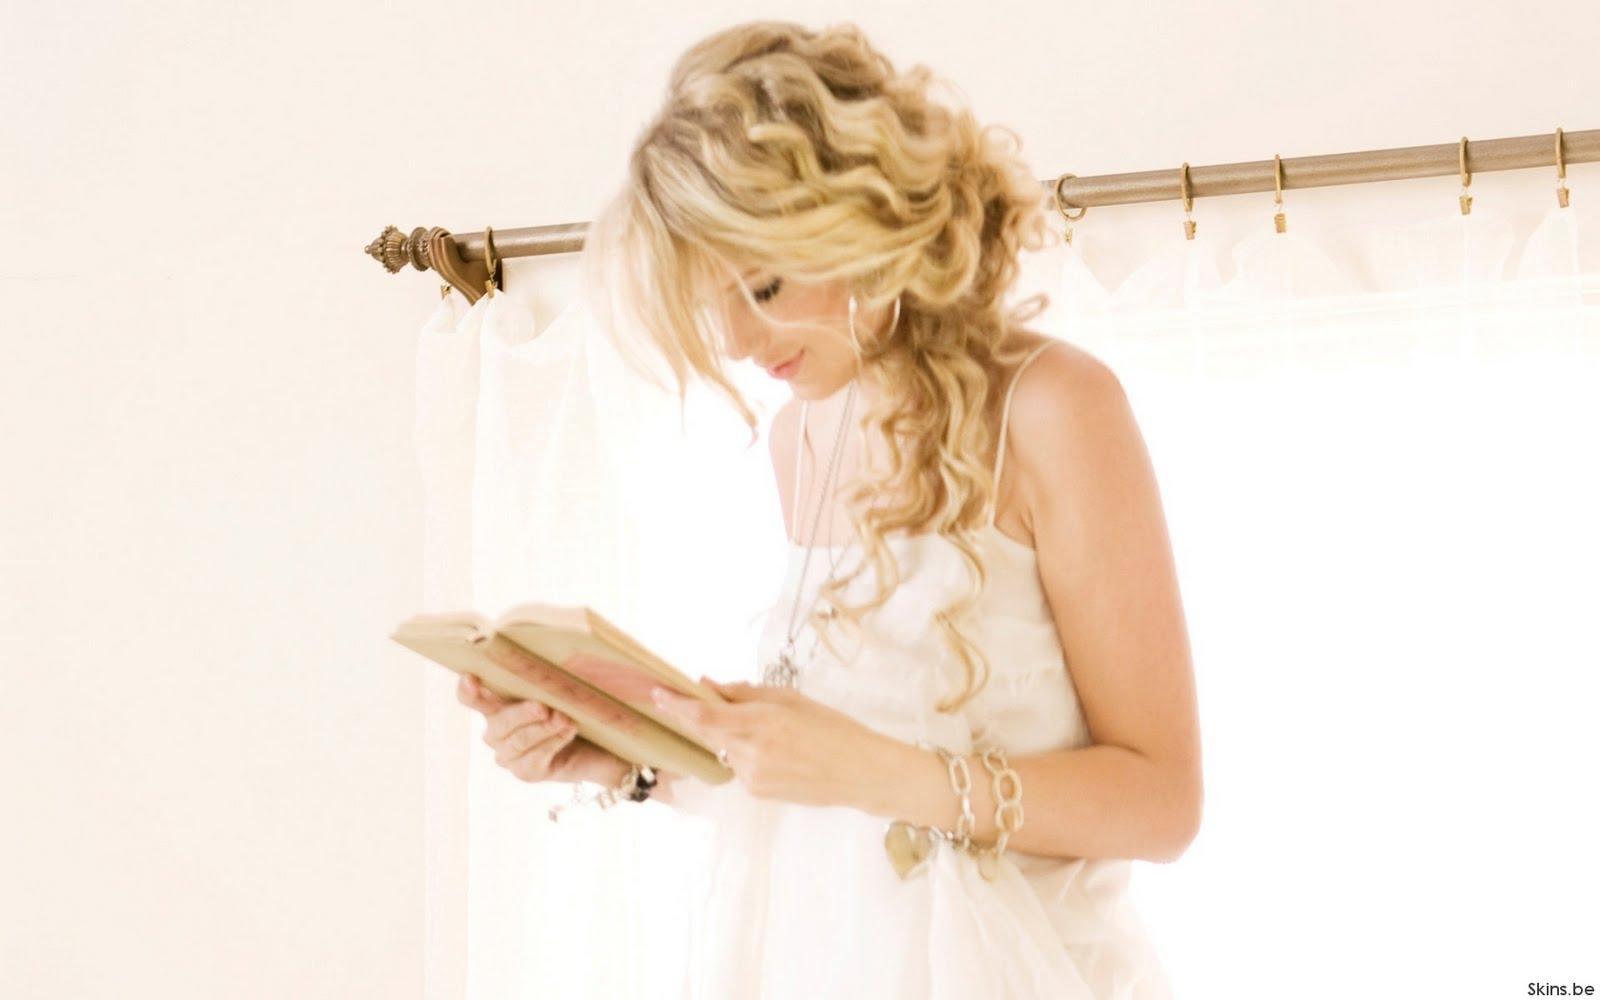 http://3.bp.blogspot.com/-rHaMTwWvgSg/TiDw496ln5I/AAAAAAAAADI/60DPakWrywM/s1600/Taylor_Swift03.jpg